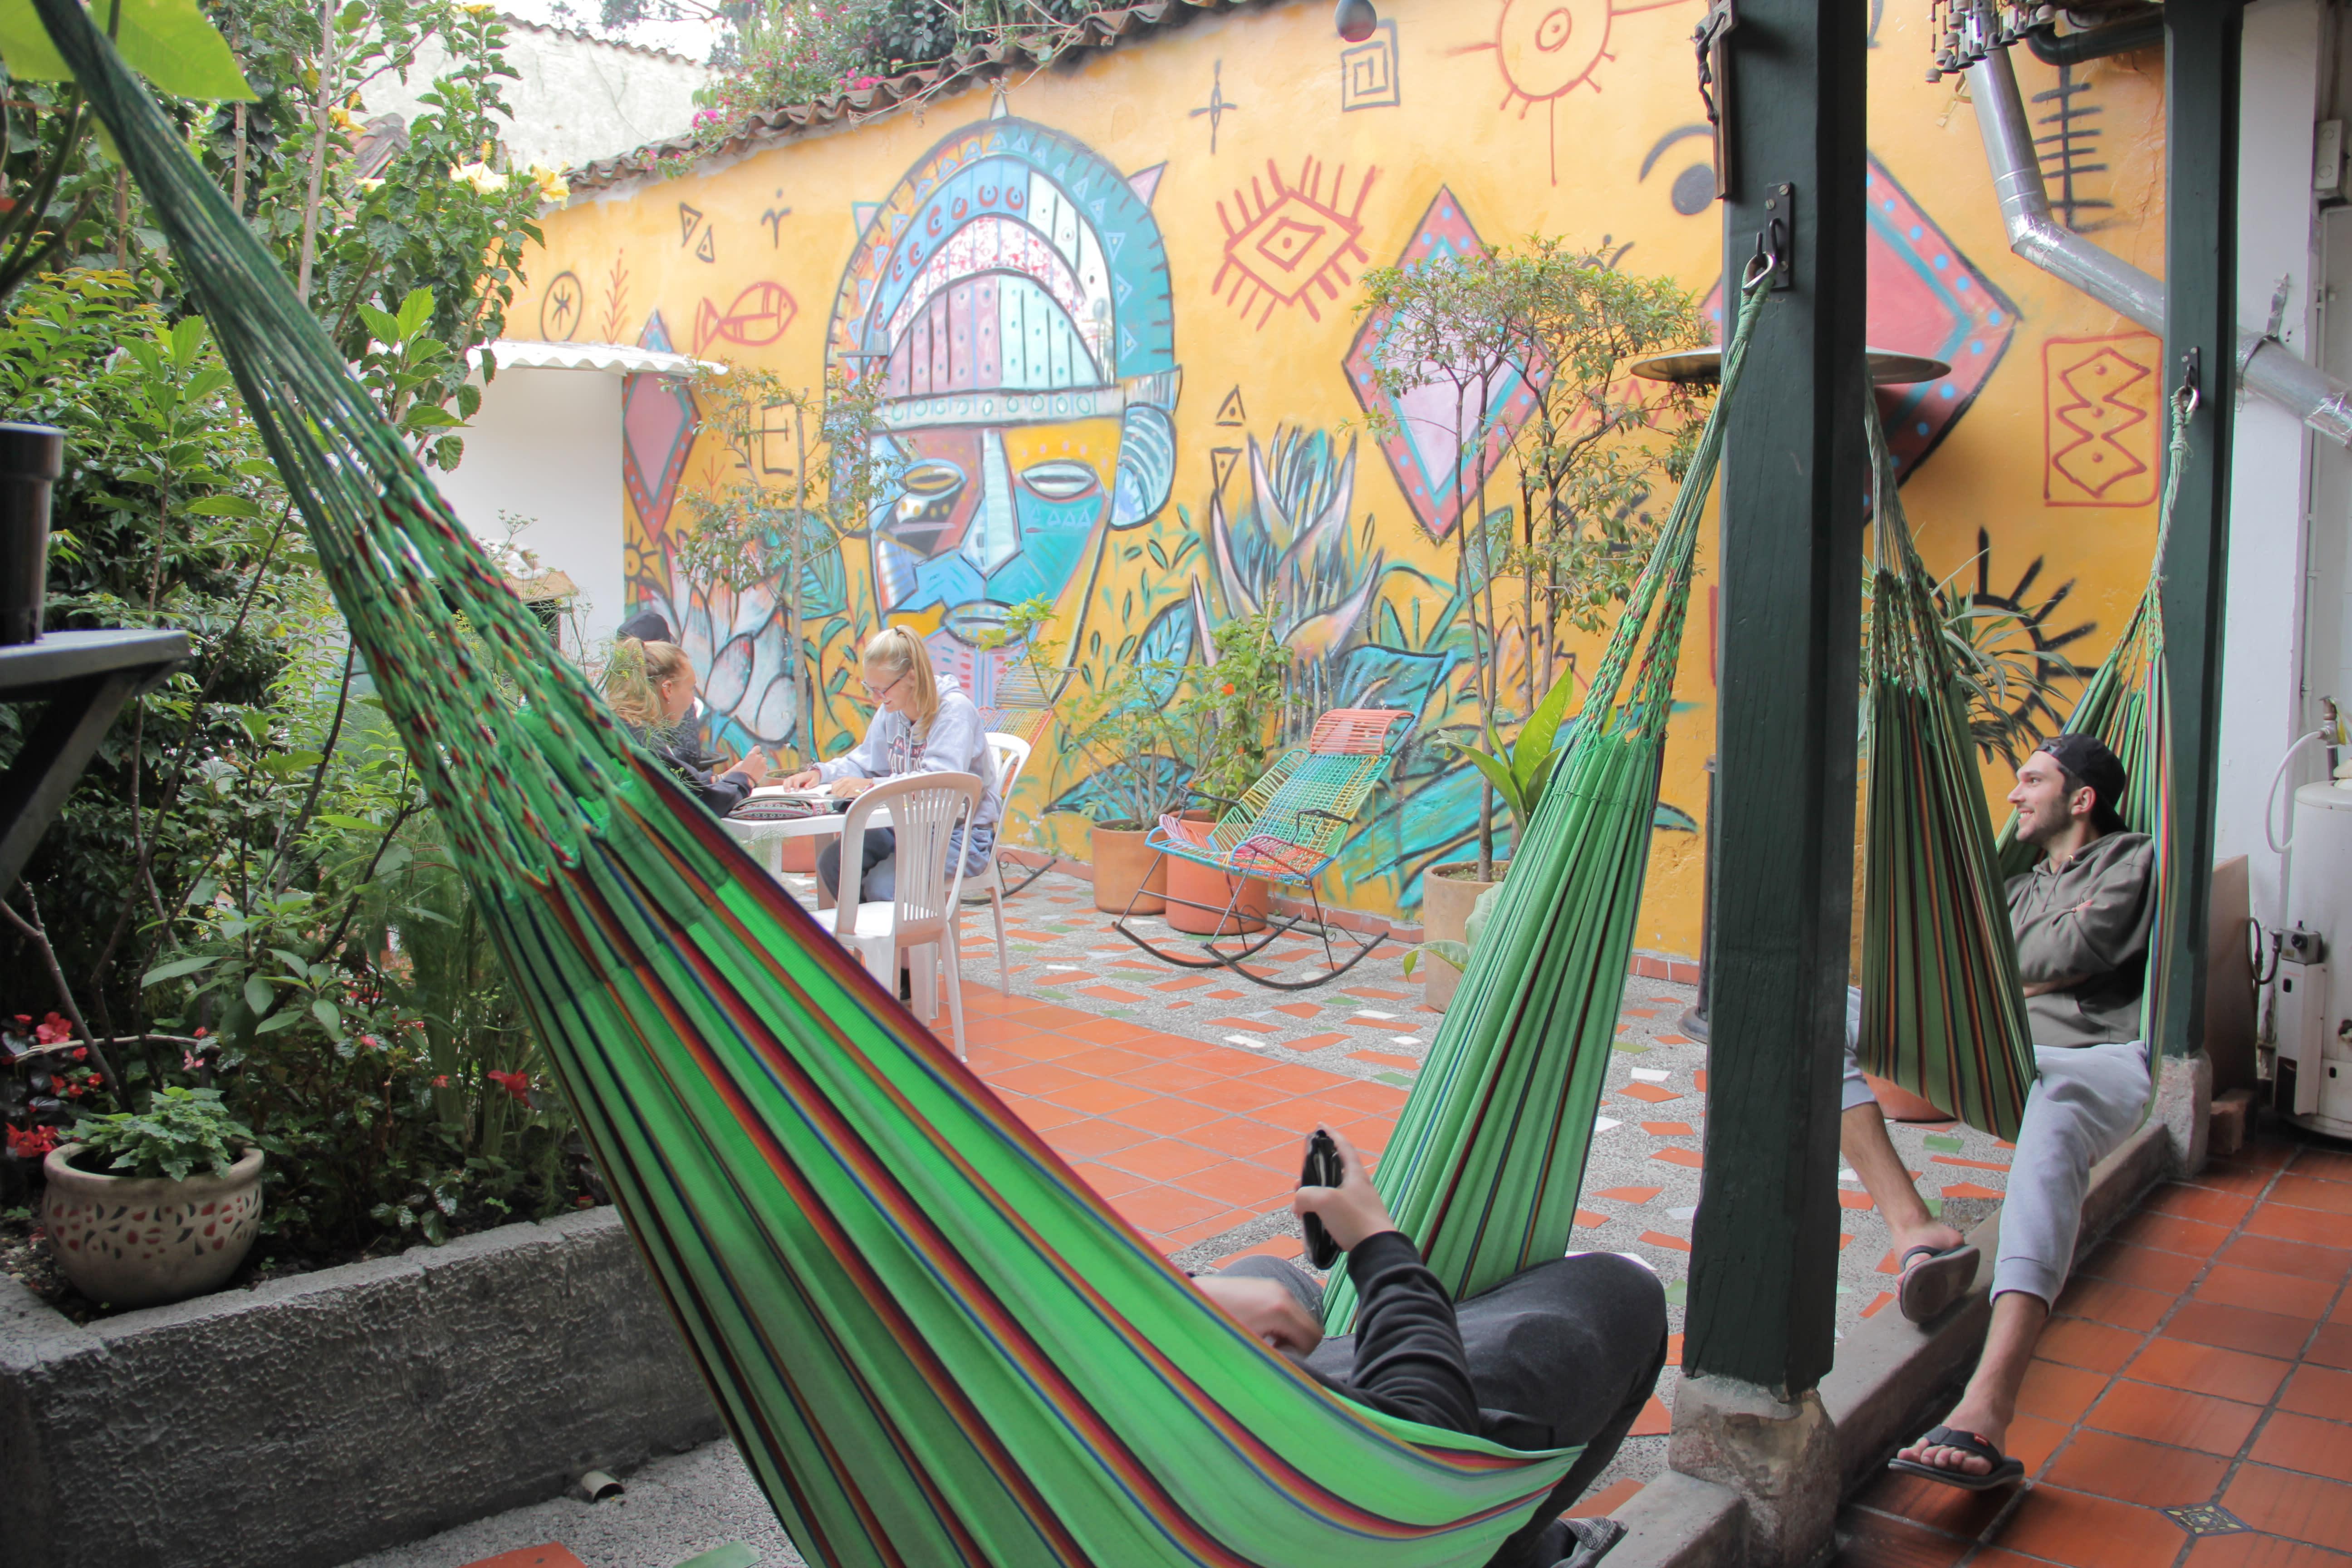 HOSTEL - Hostel Sue Candelaria